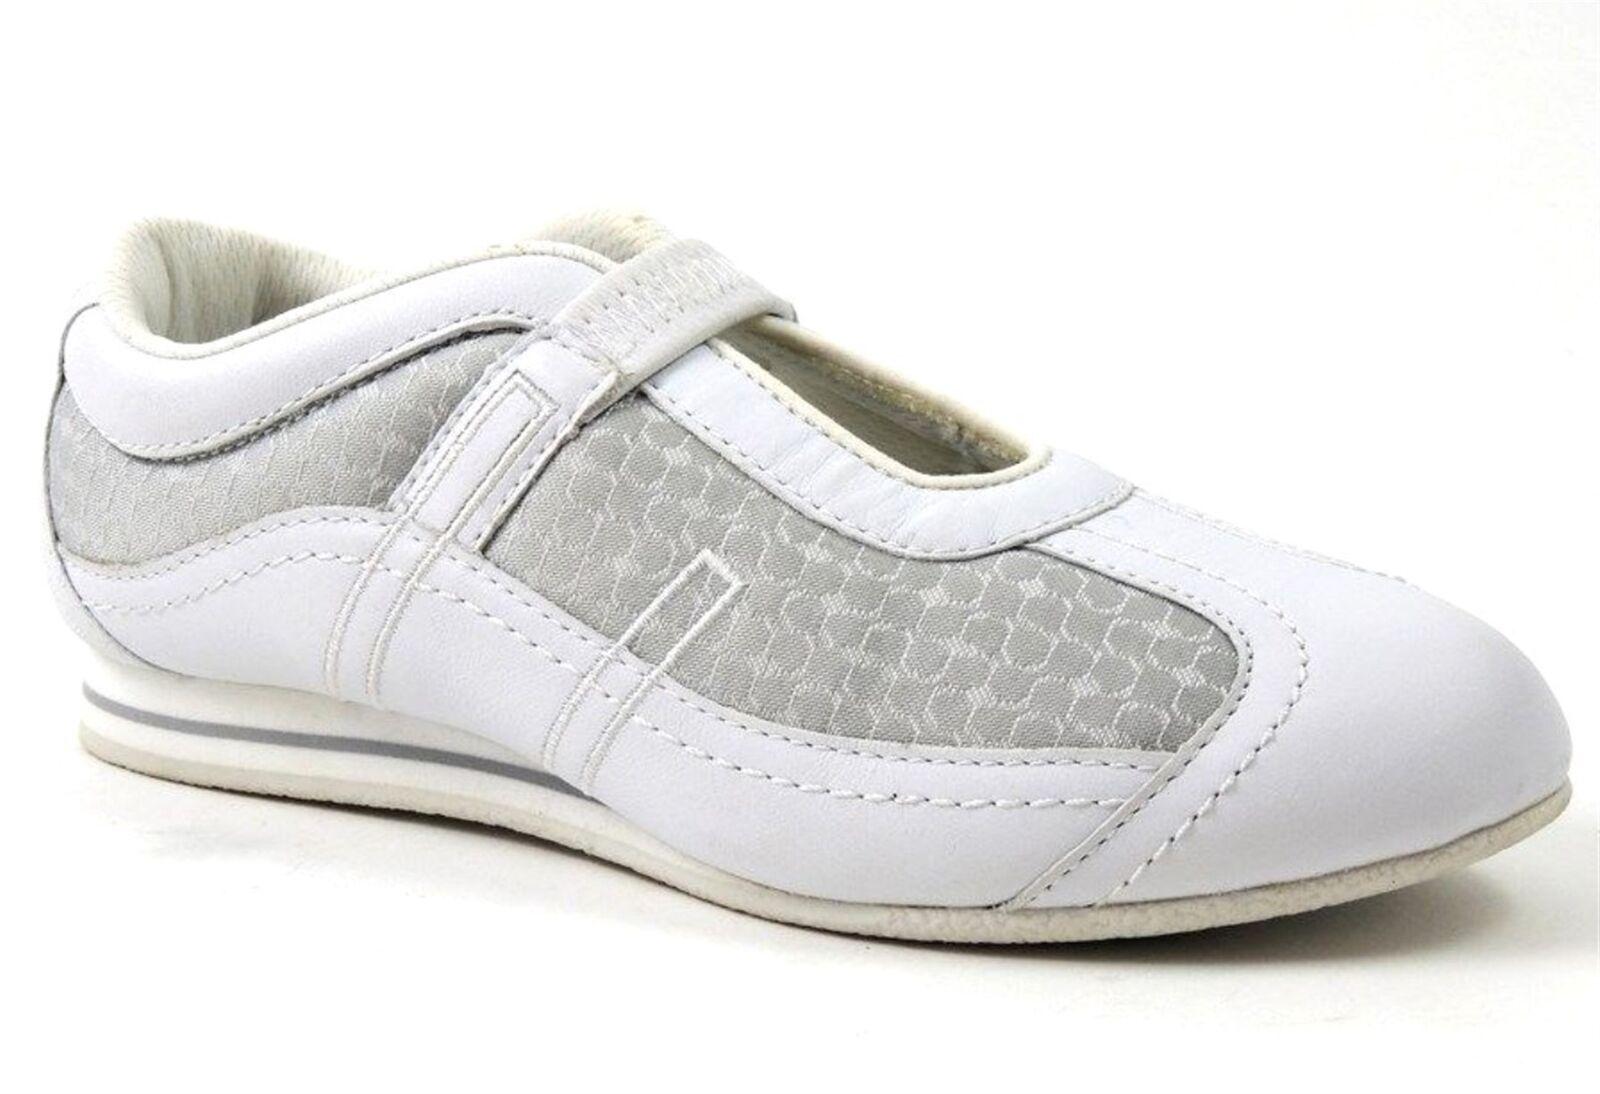 Easy Spirit Women's Optimum Sneakers Leather White Grey Size 6 M